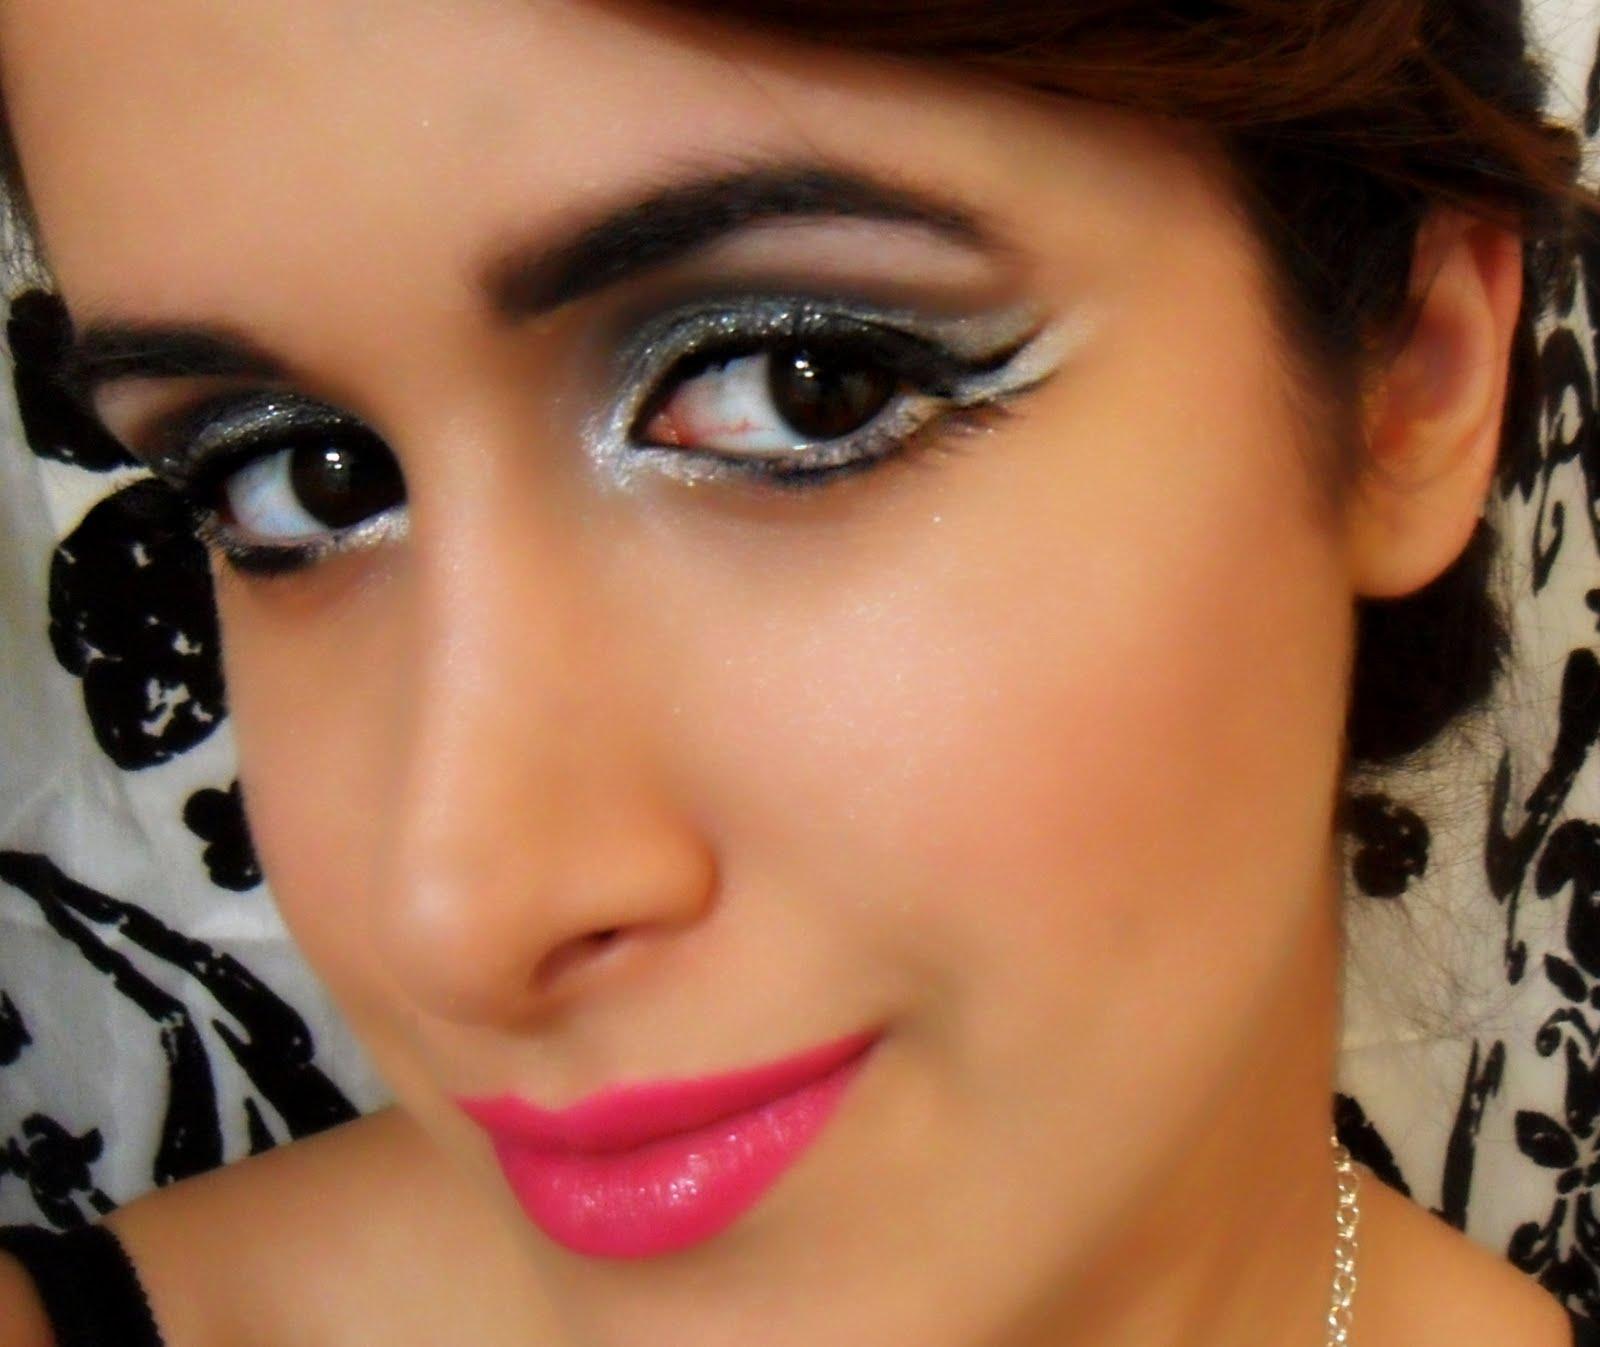 Makeup Artist Theater Makeup All That Jazz